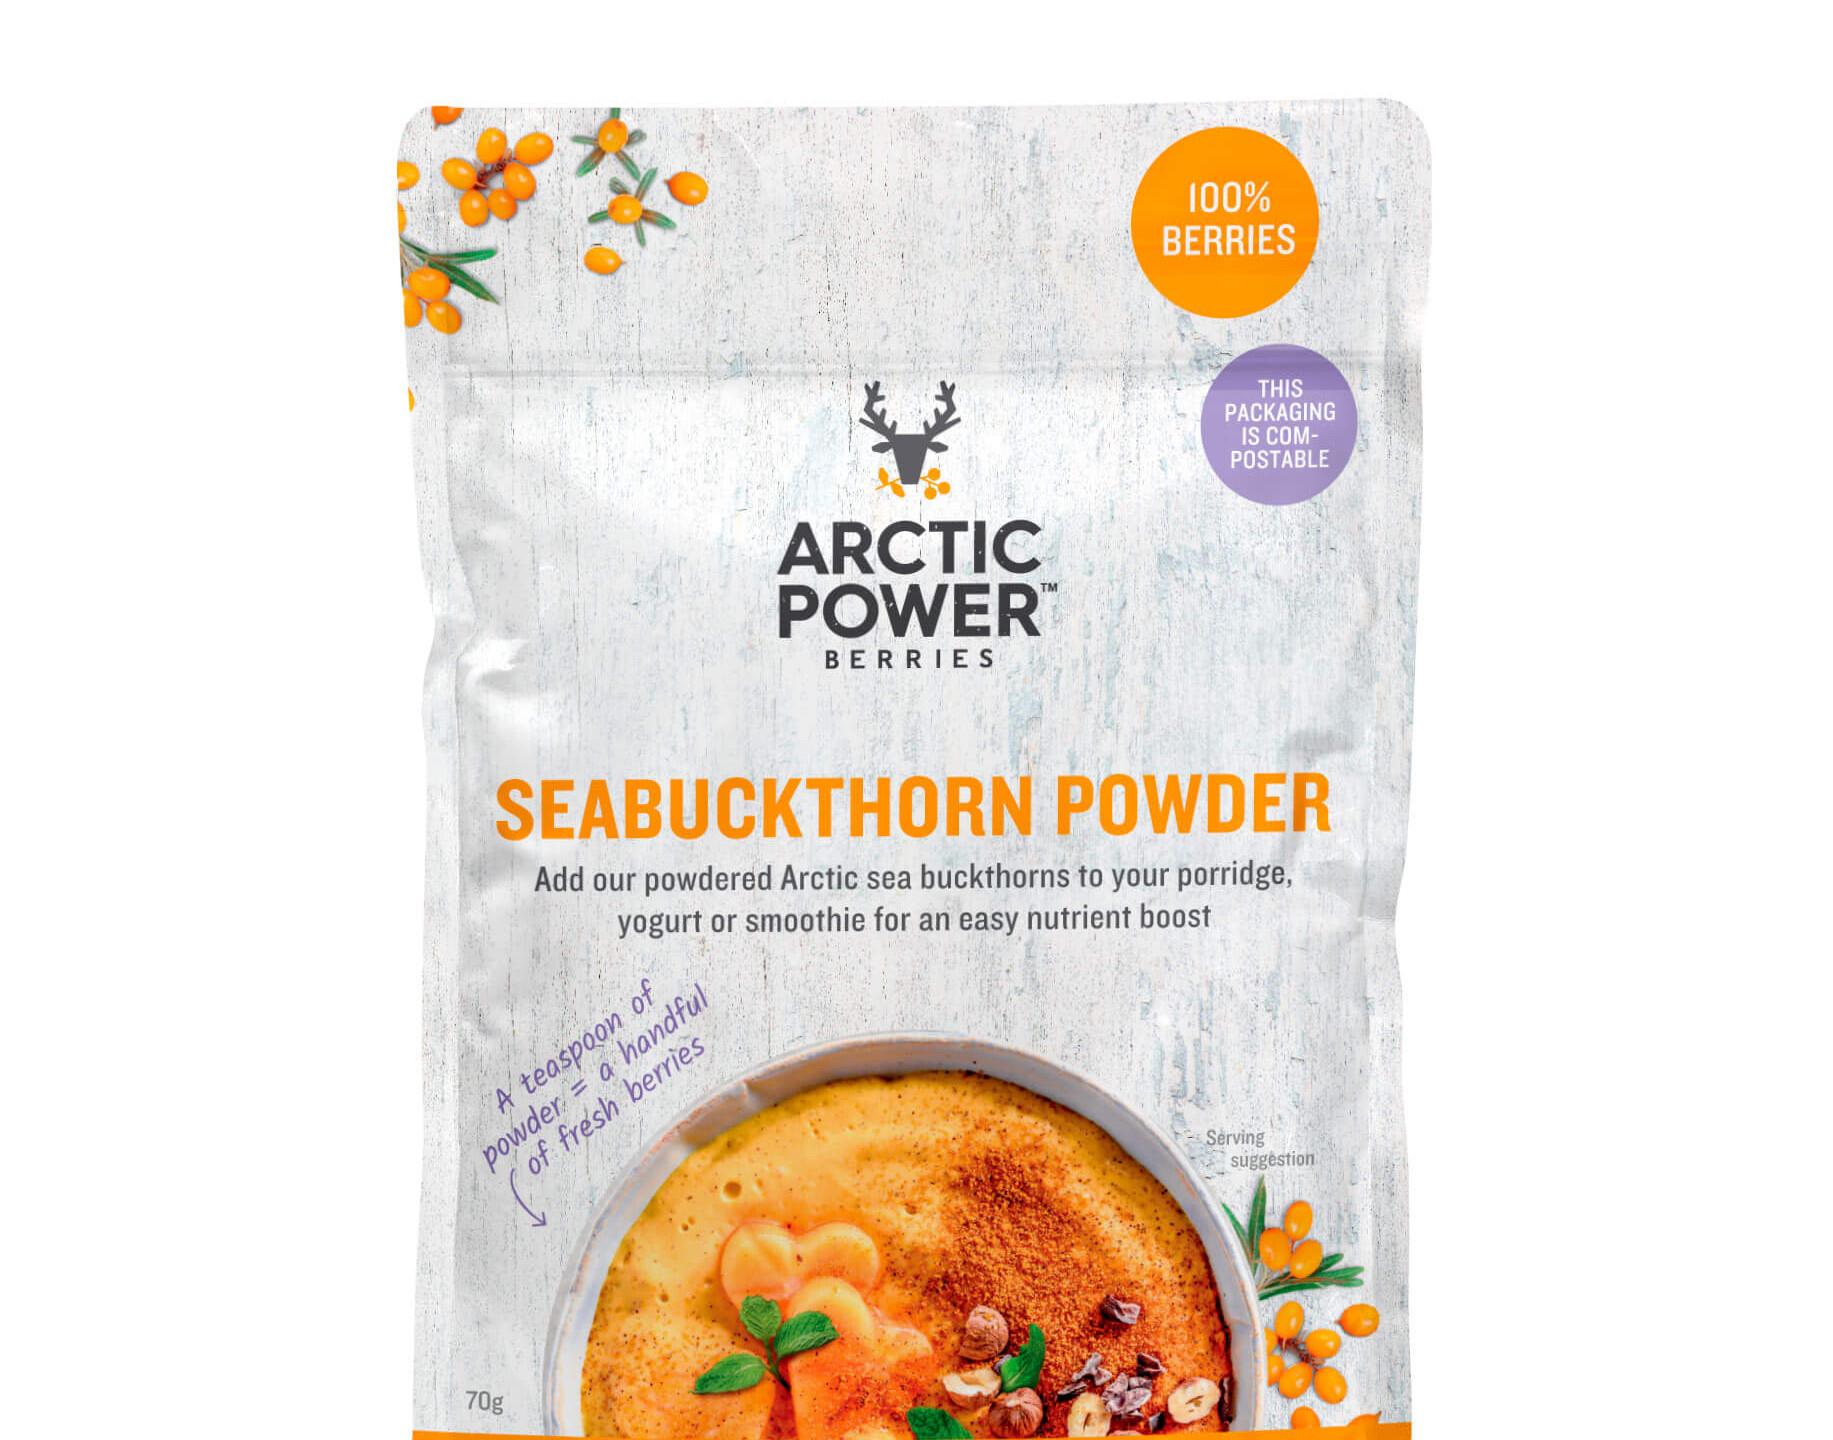 Pure Sea Buckthorn Powder